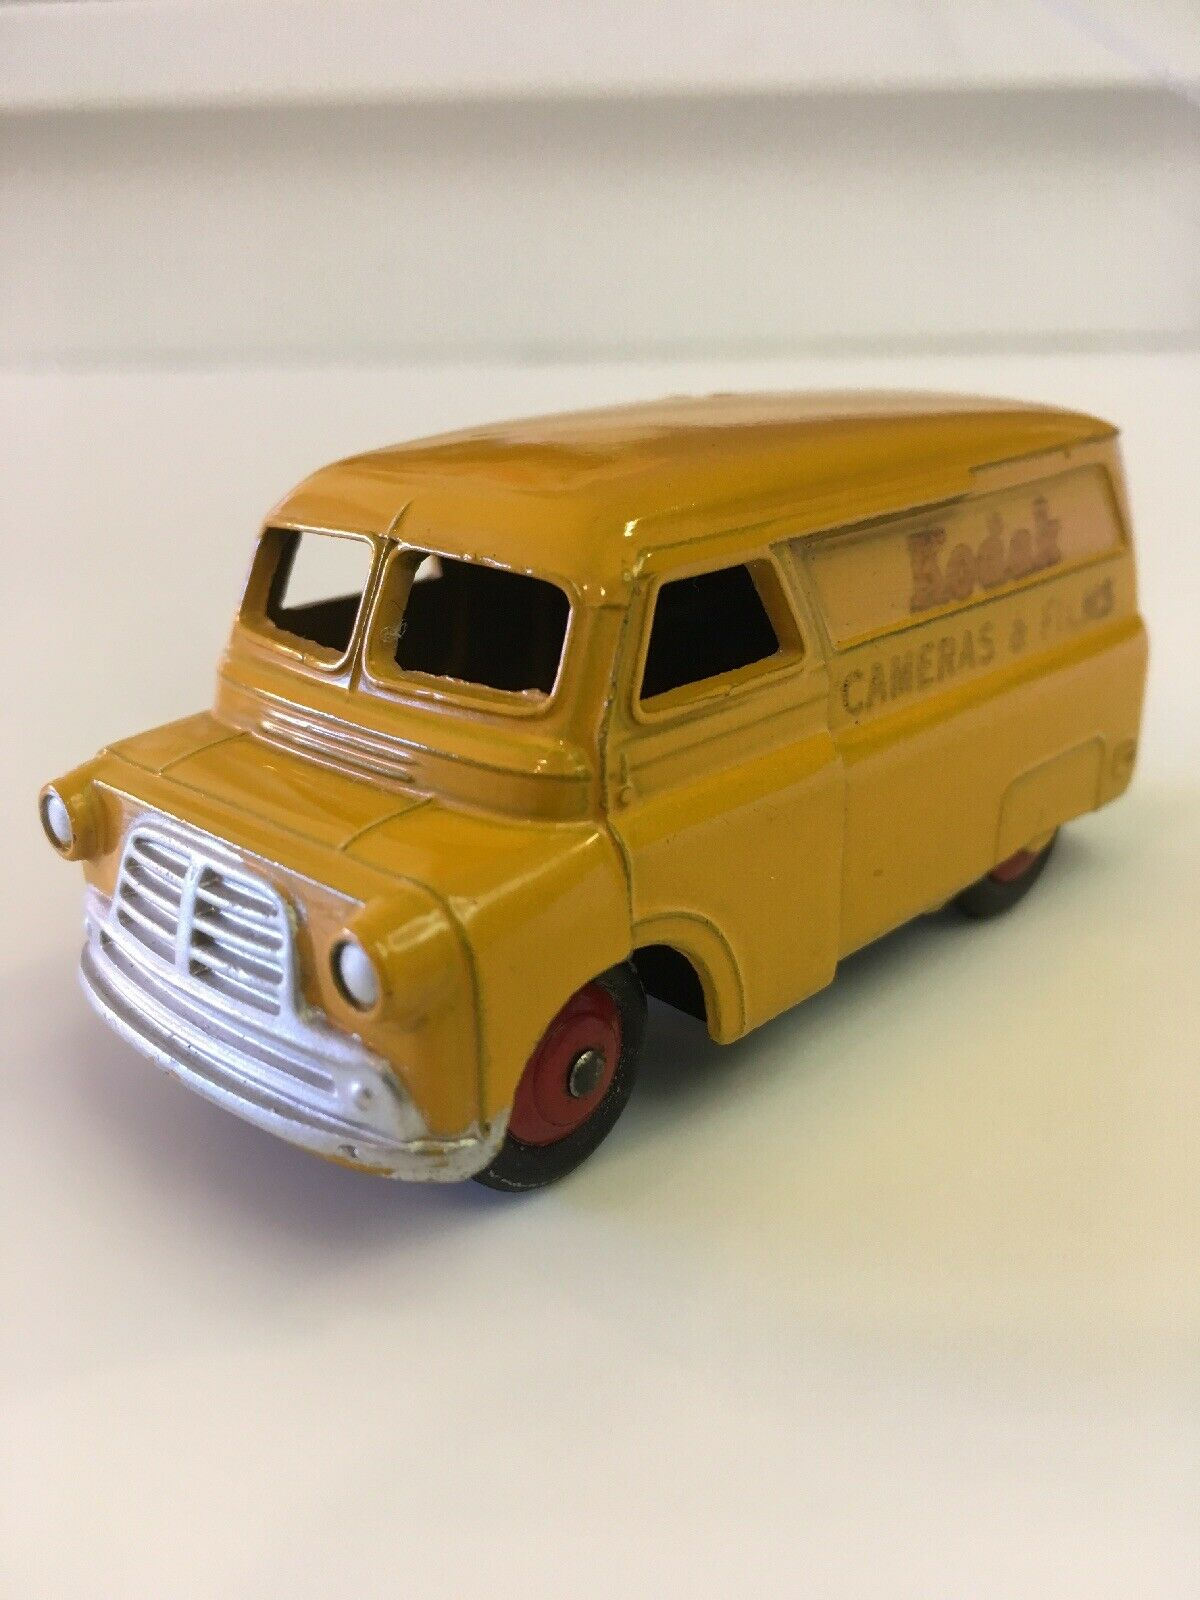 DINKY TOYS MECCANO BEDFORD KODAK  caméras & films Van NO.480G 1954 jaune  vente discount en ligne bas prix